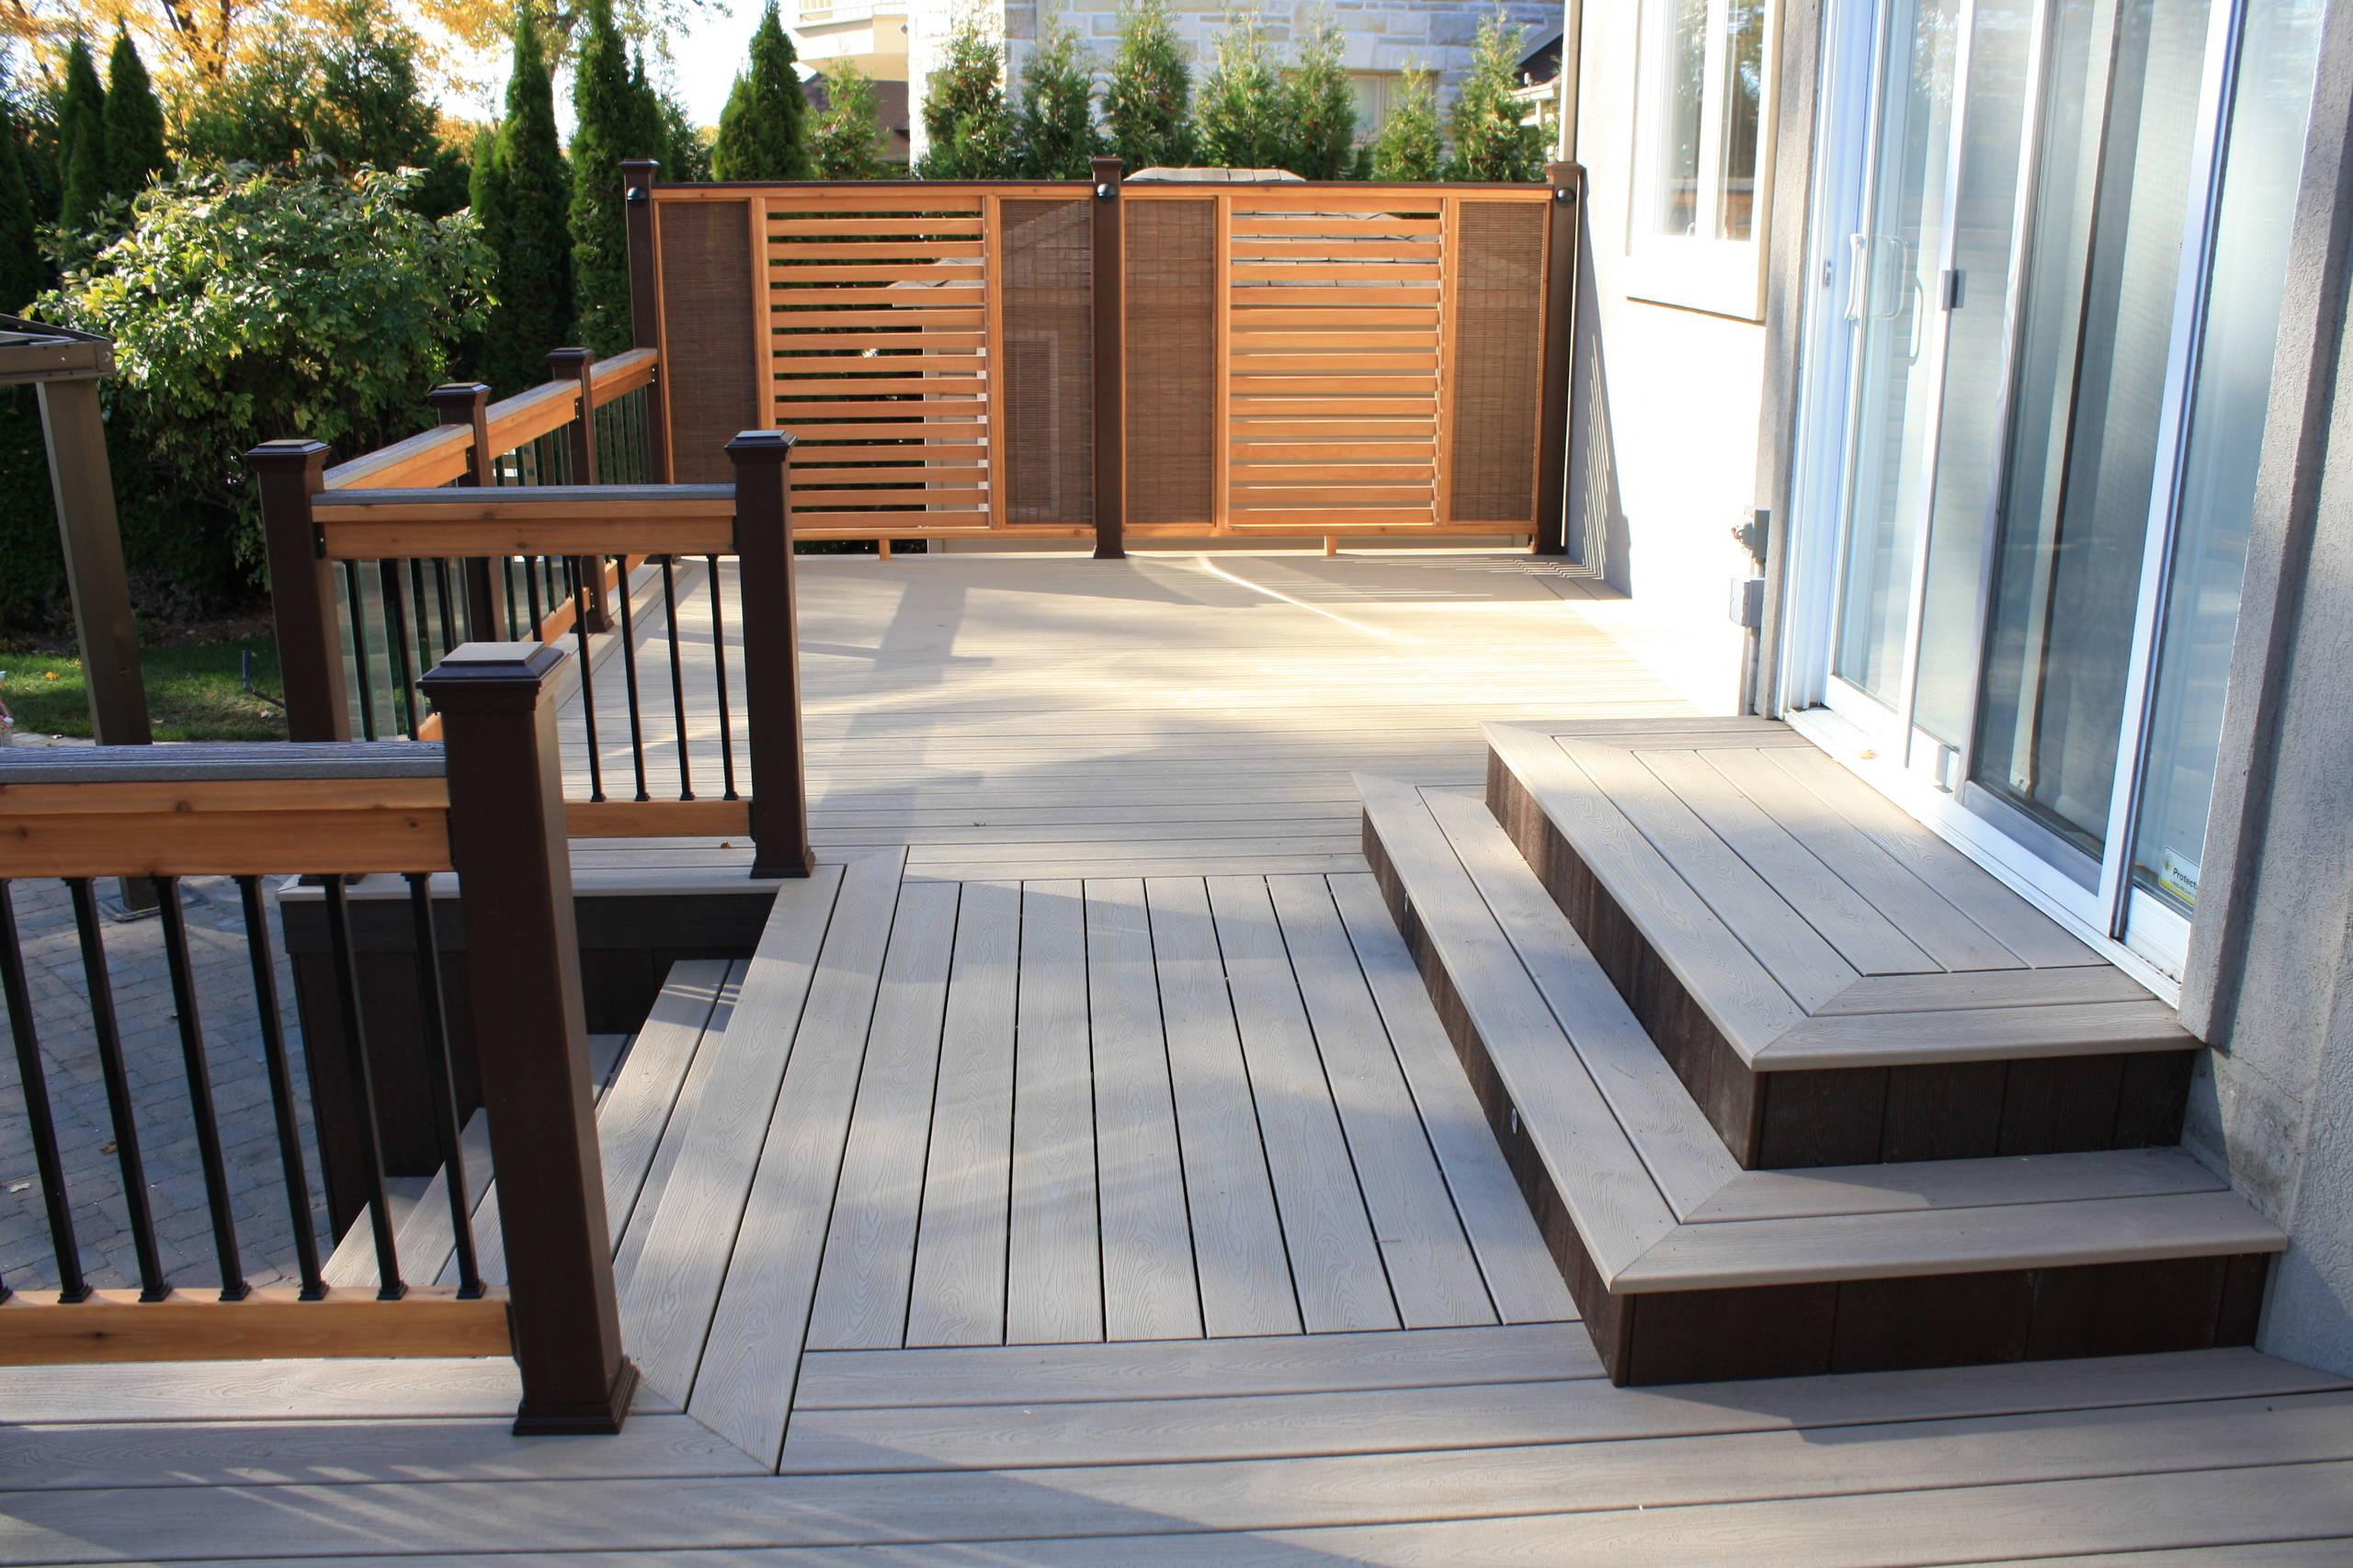 75 Beautiful Modern Deck Pictures Ideas November 2020 Houzz